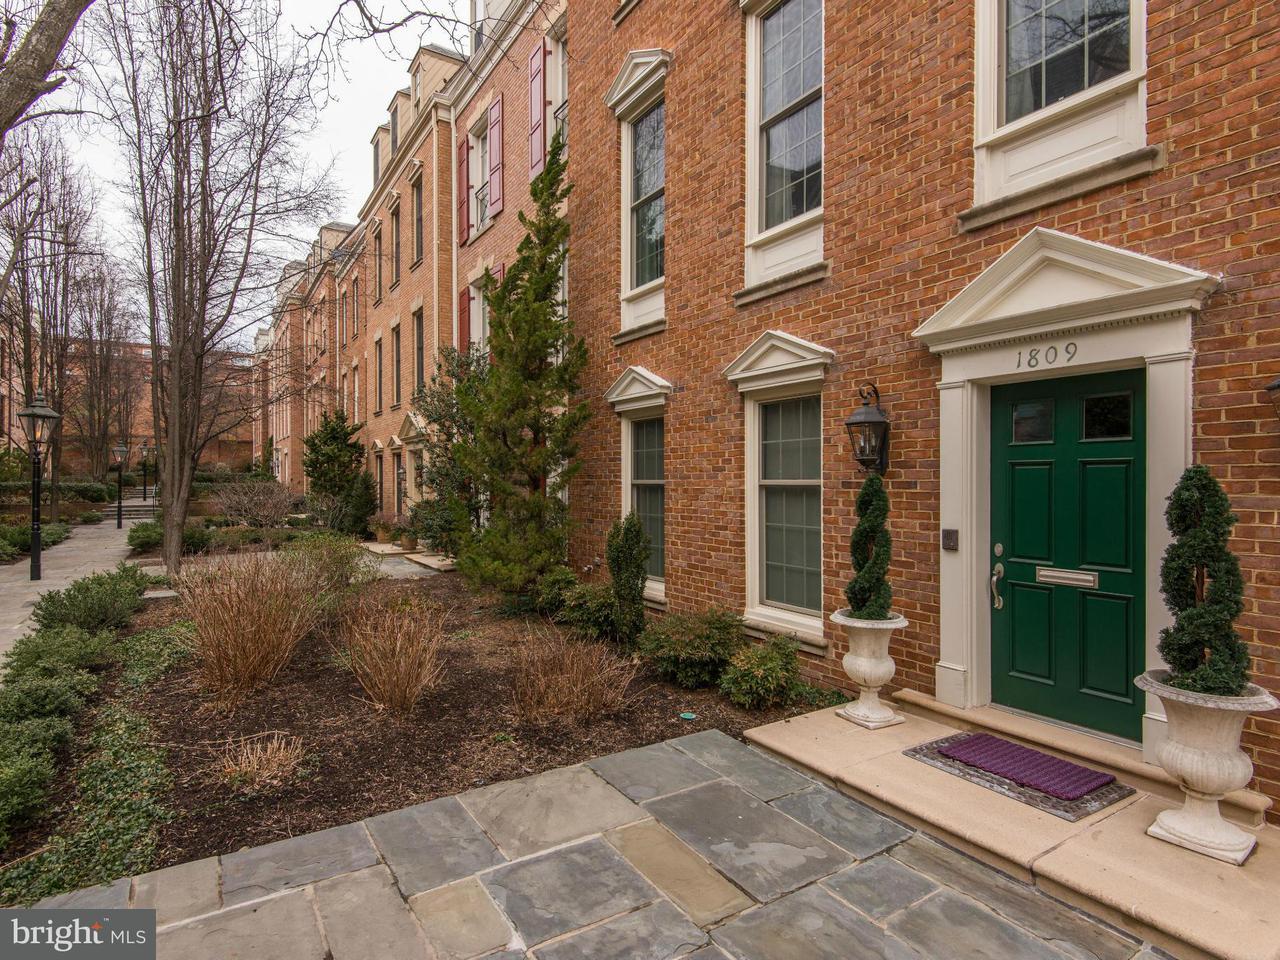 Condominium for Sale at 1809 KALORAMA SQUARE NW 1809 KALORAMA SQUARE NW Washington, District Of Columbia 20009 United States